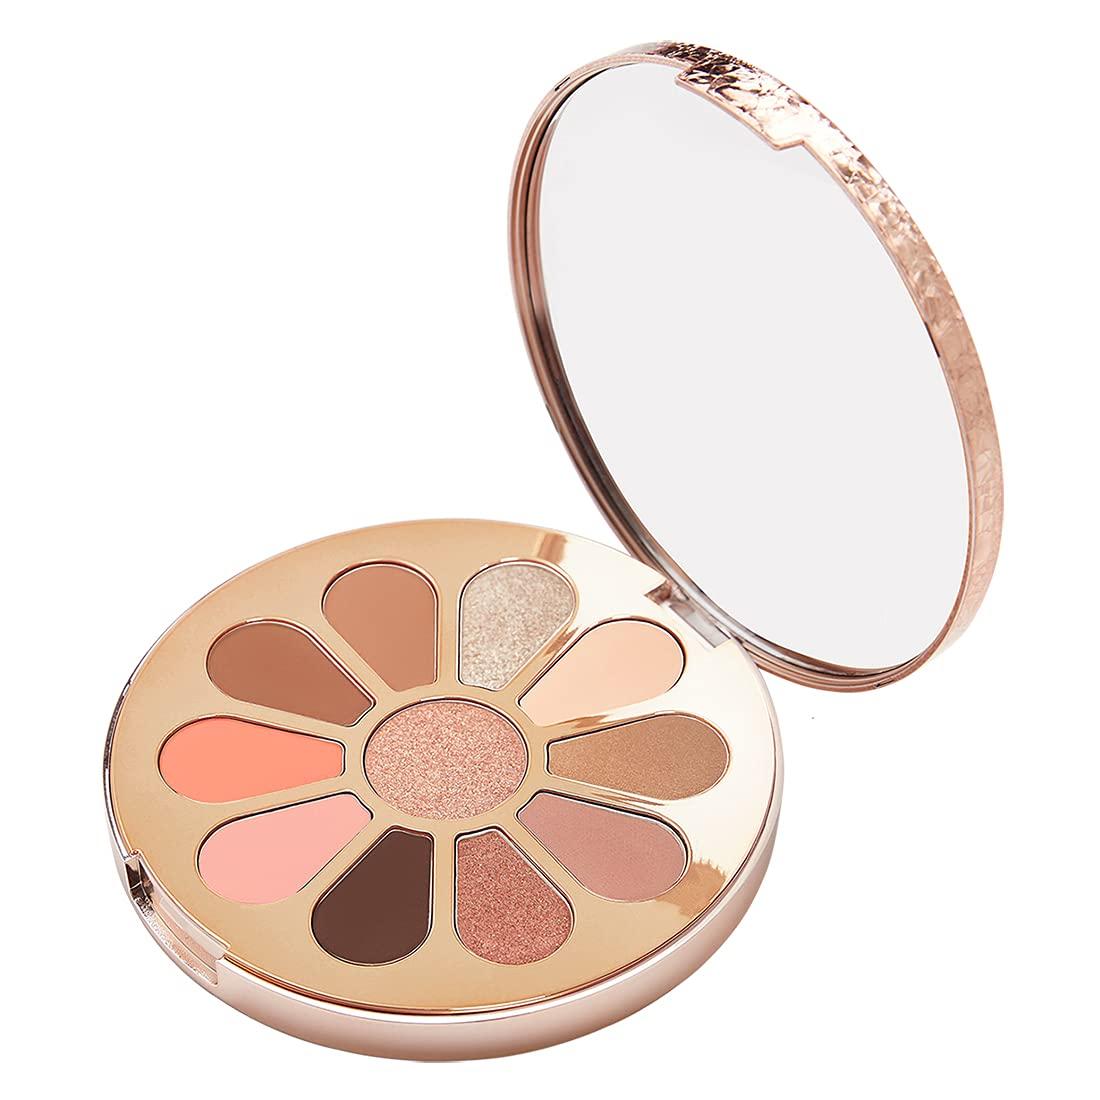 Eyeshadow Palette 'Blossom (Daily Blossom)